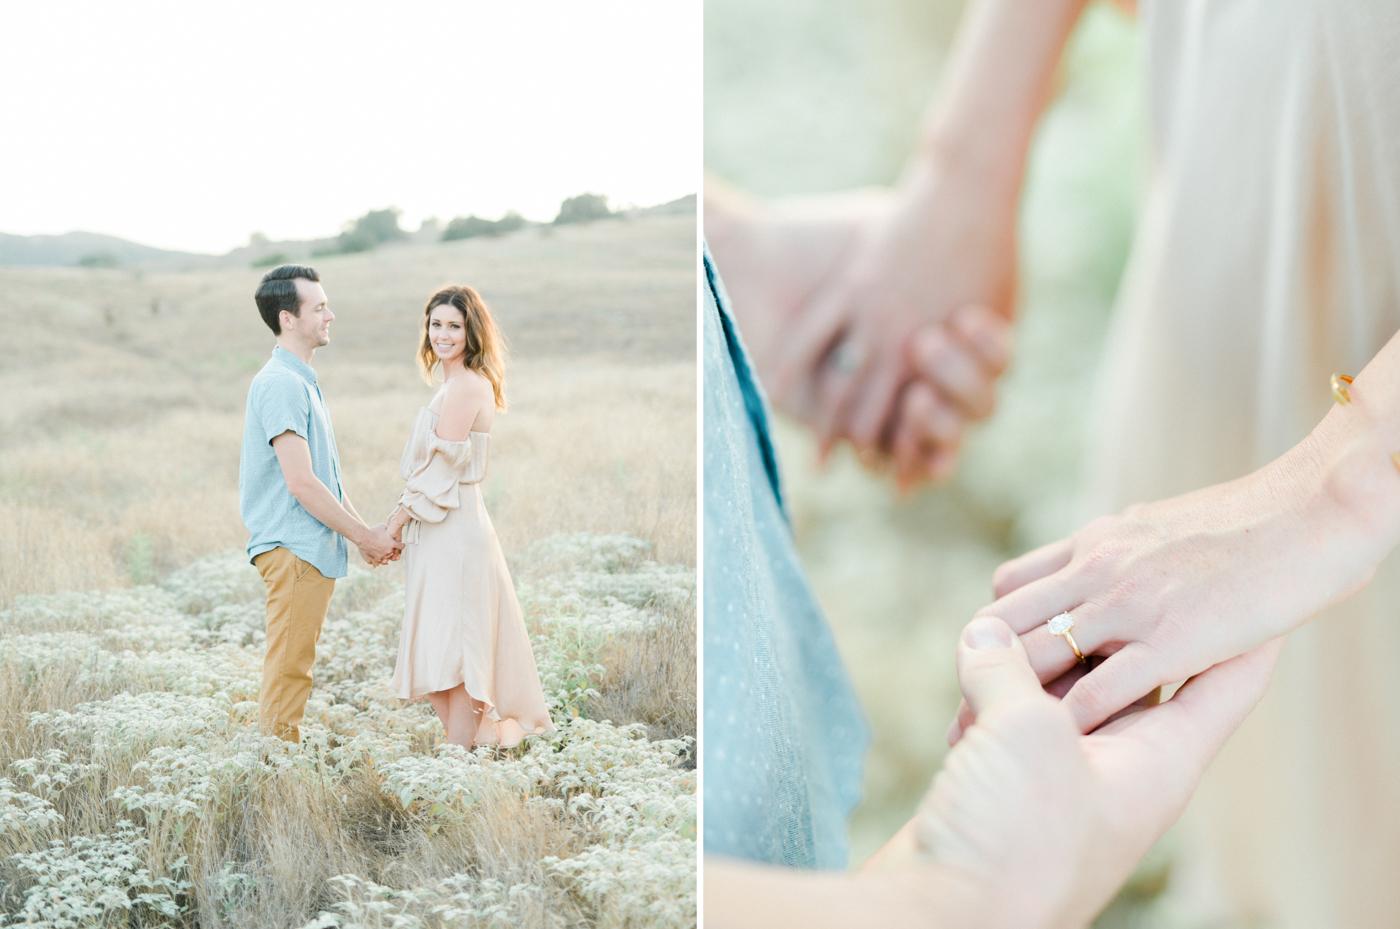 Malibu_Creek_State_Park_Romantic_Engagement_Session_C&J_romantic-23.jpg